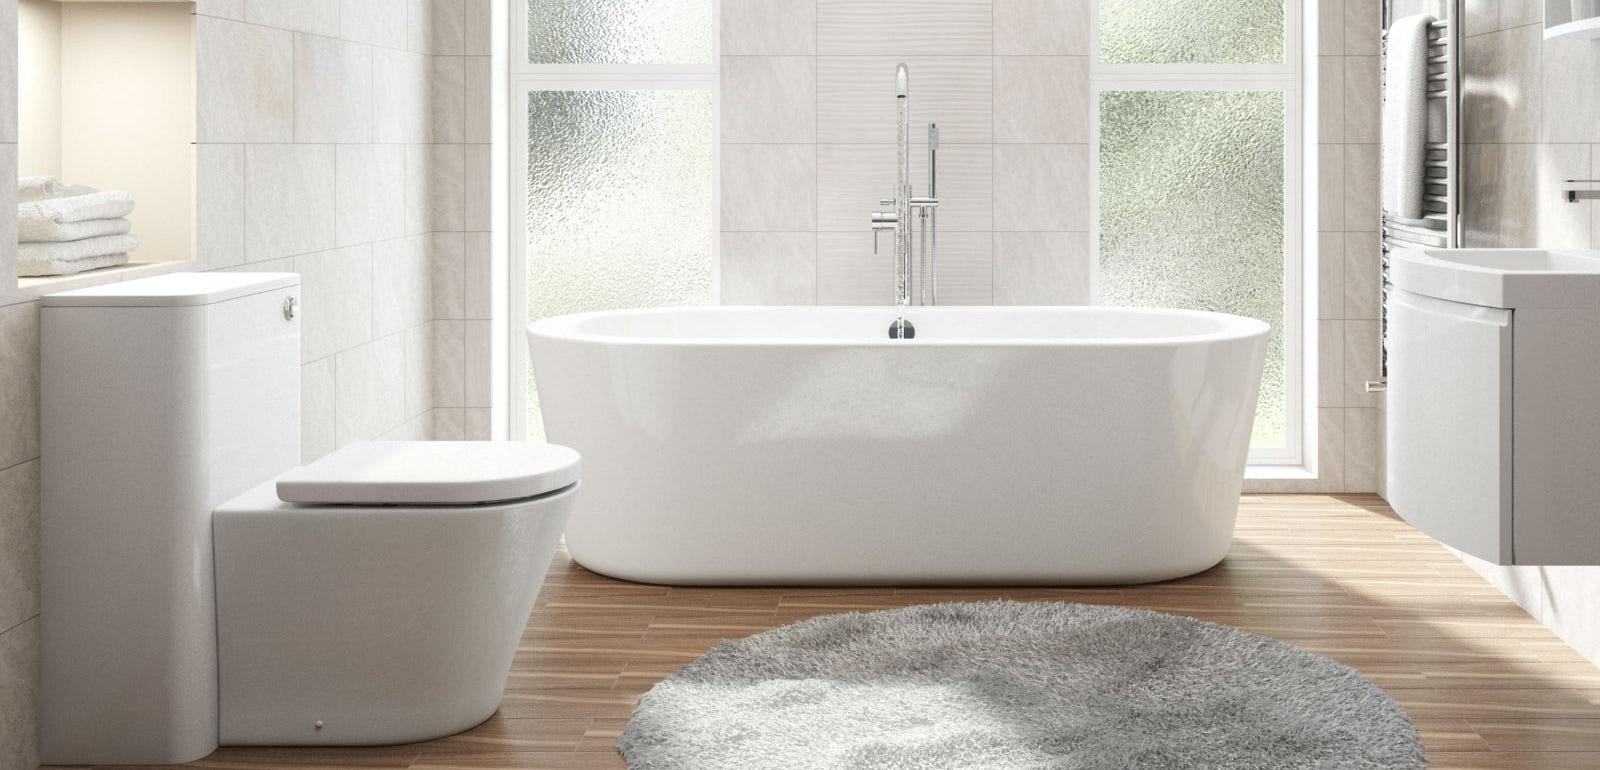 Designing A Contemporary Style Bathroom